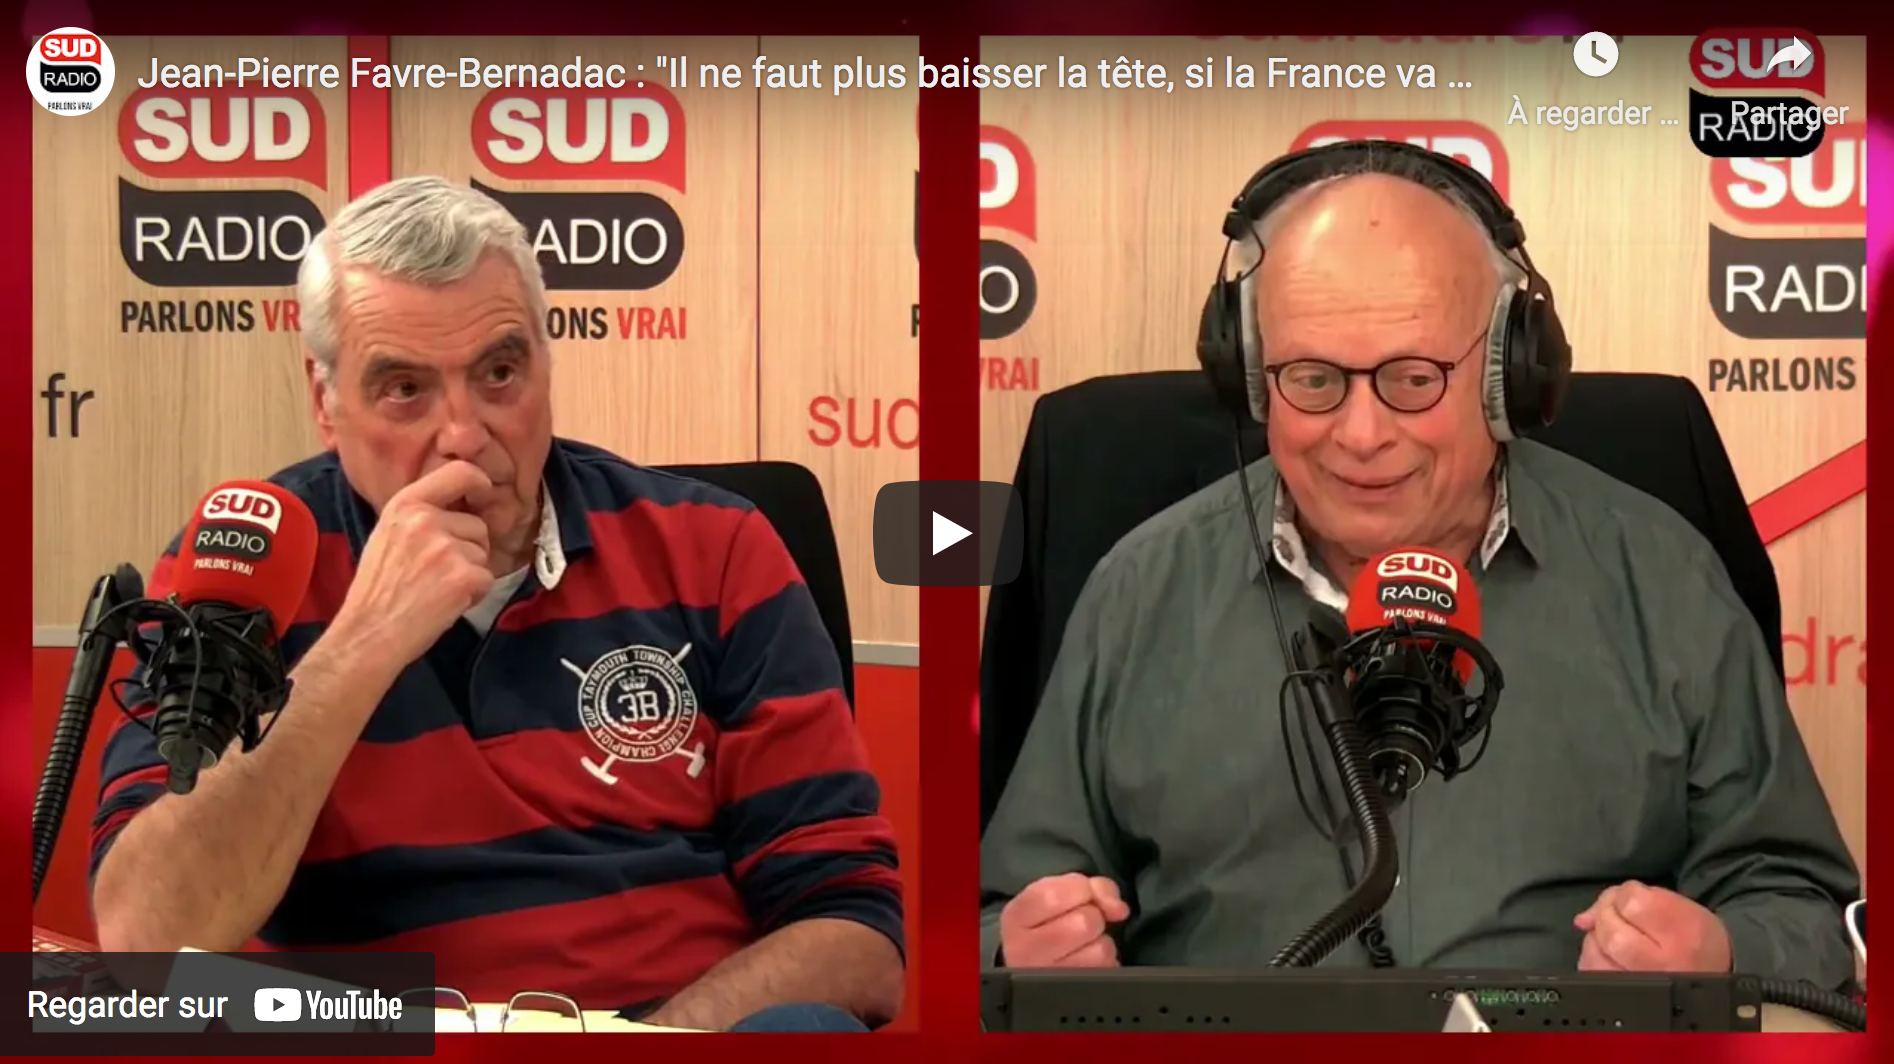 "Jean-Pierre Favre-Bernadac : ""Il ne faut plus baisser la tête, si la France va mal, il faut le dire"" (VIDÉO)"